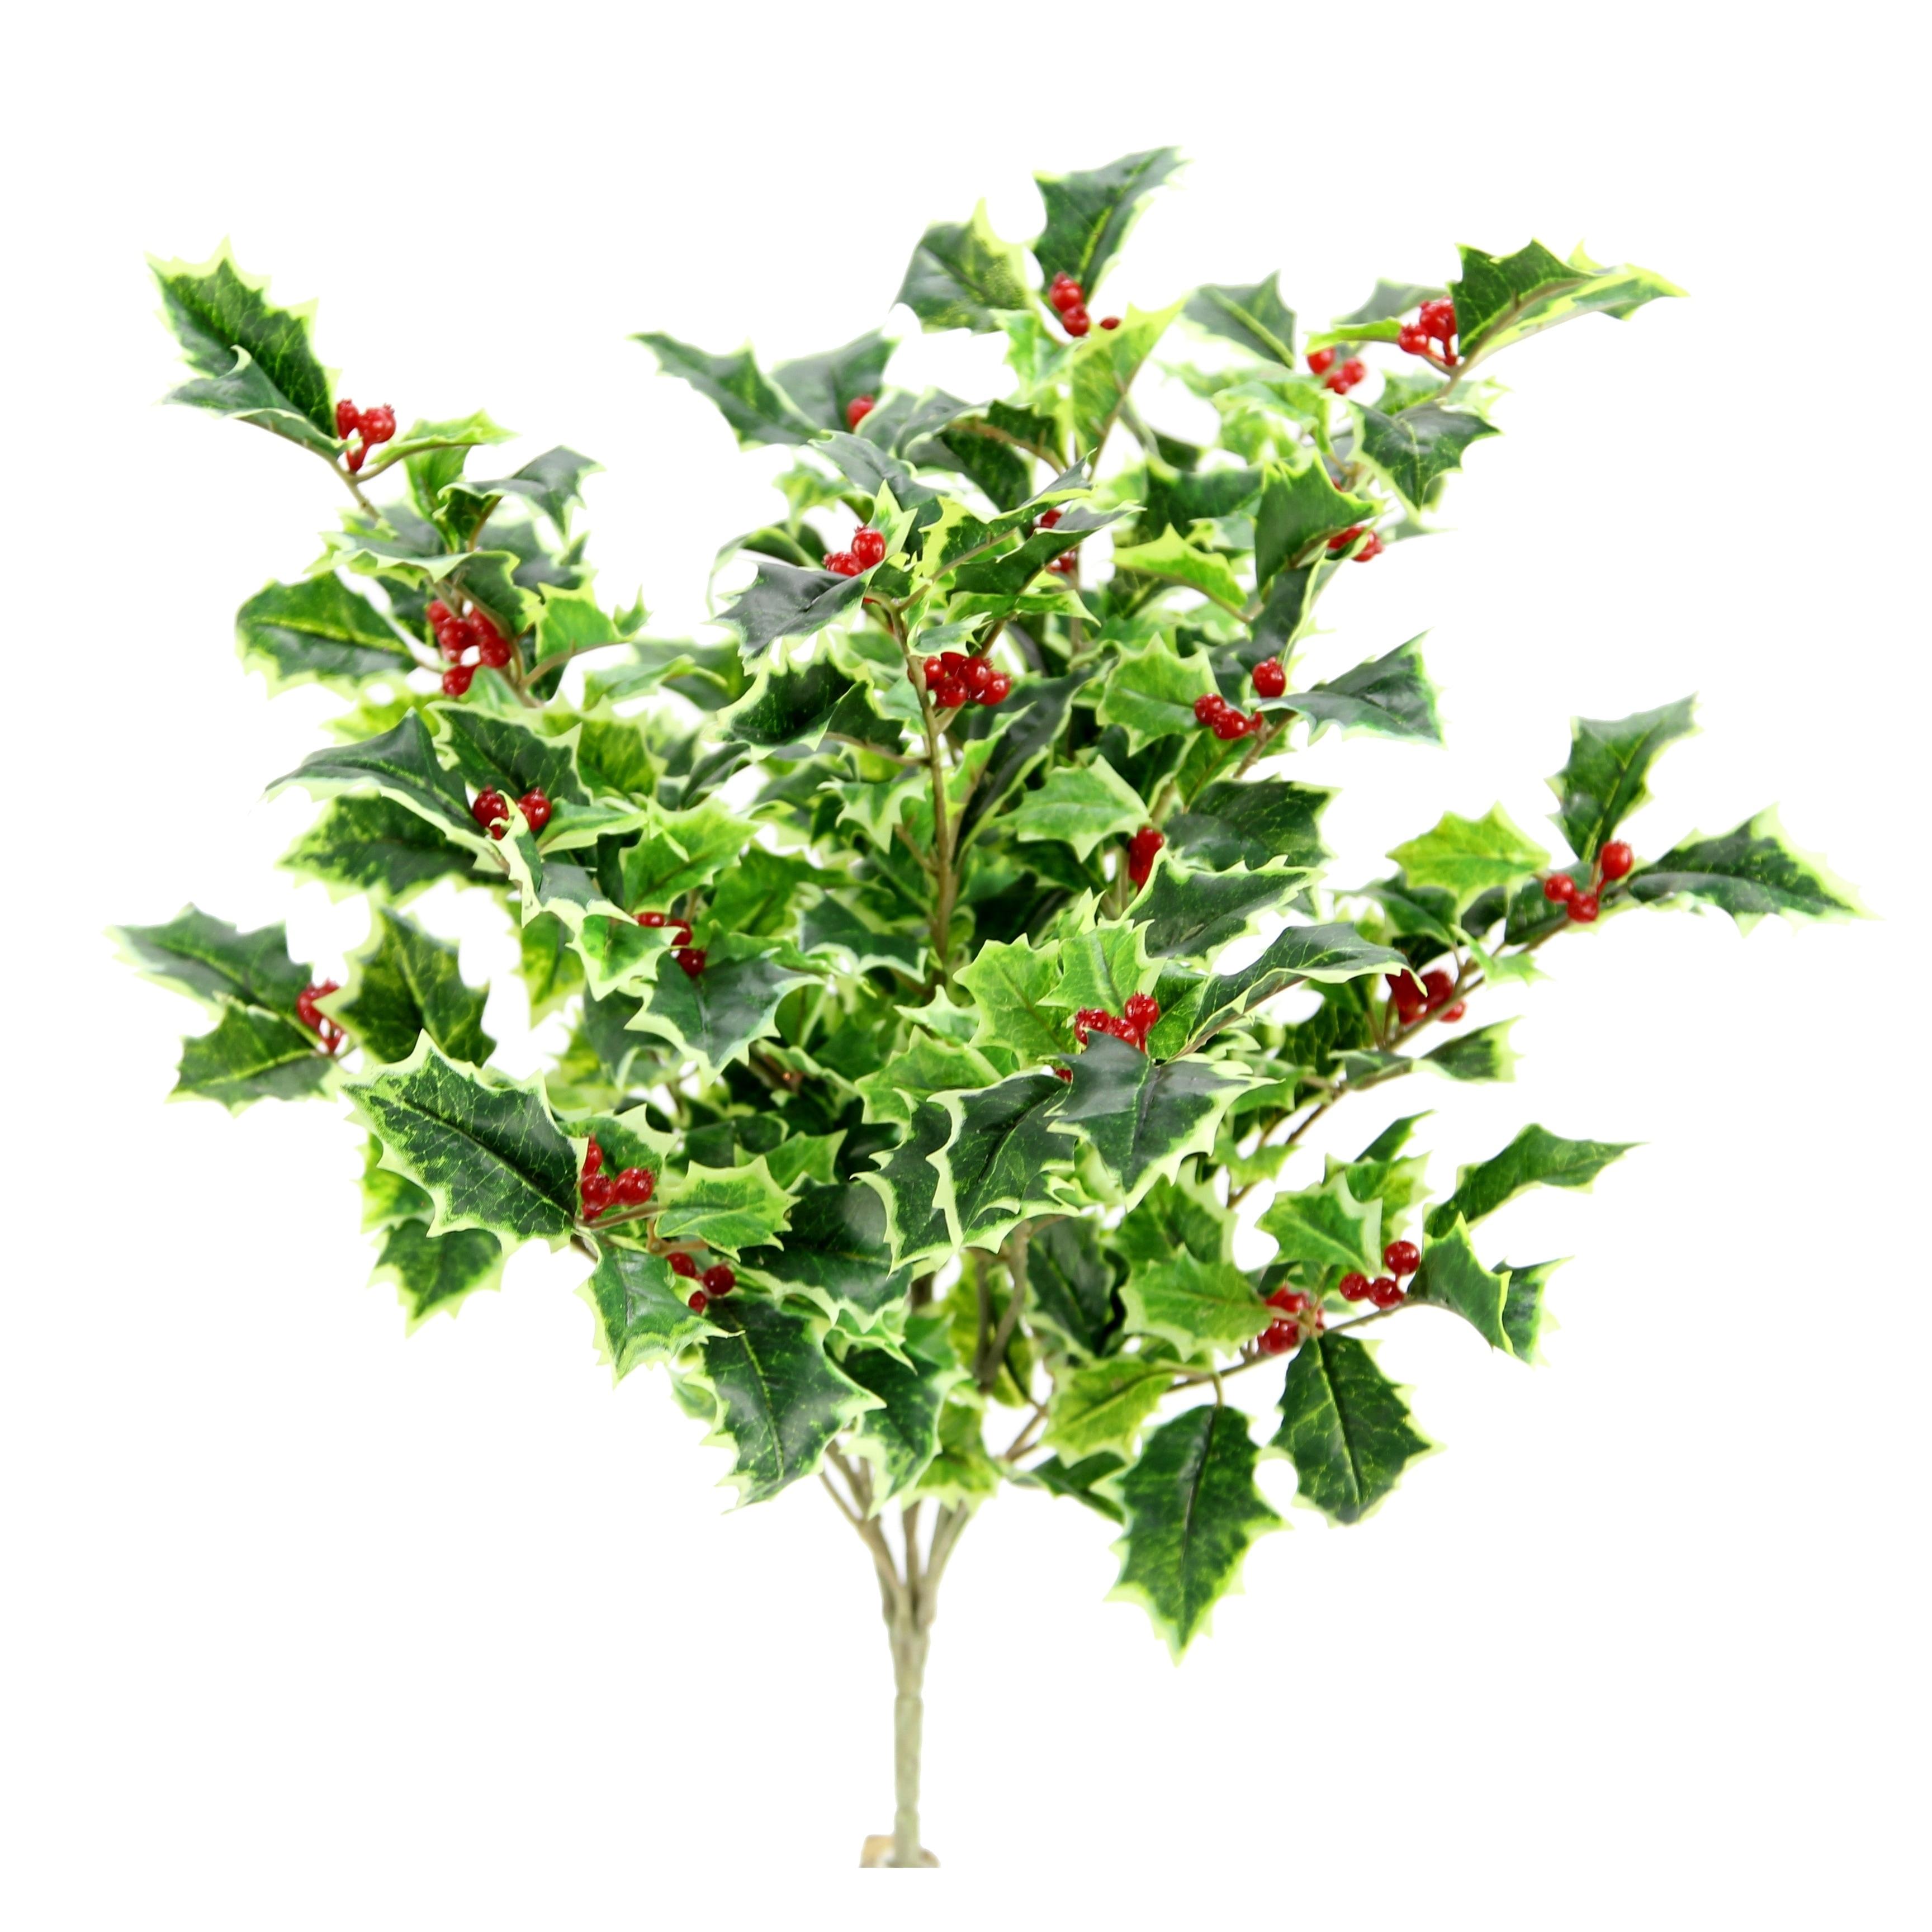 Christmas Leaves.Artificial Holly Leaves Berries Christmas Bush